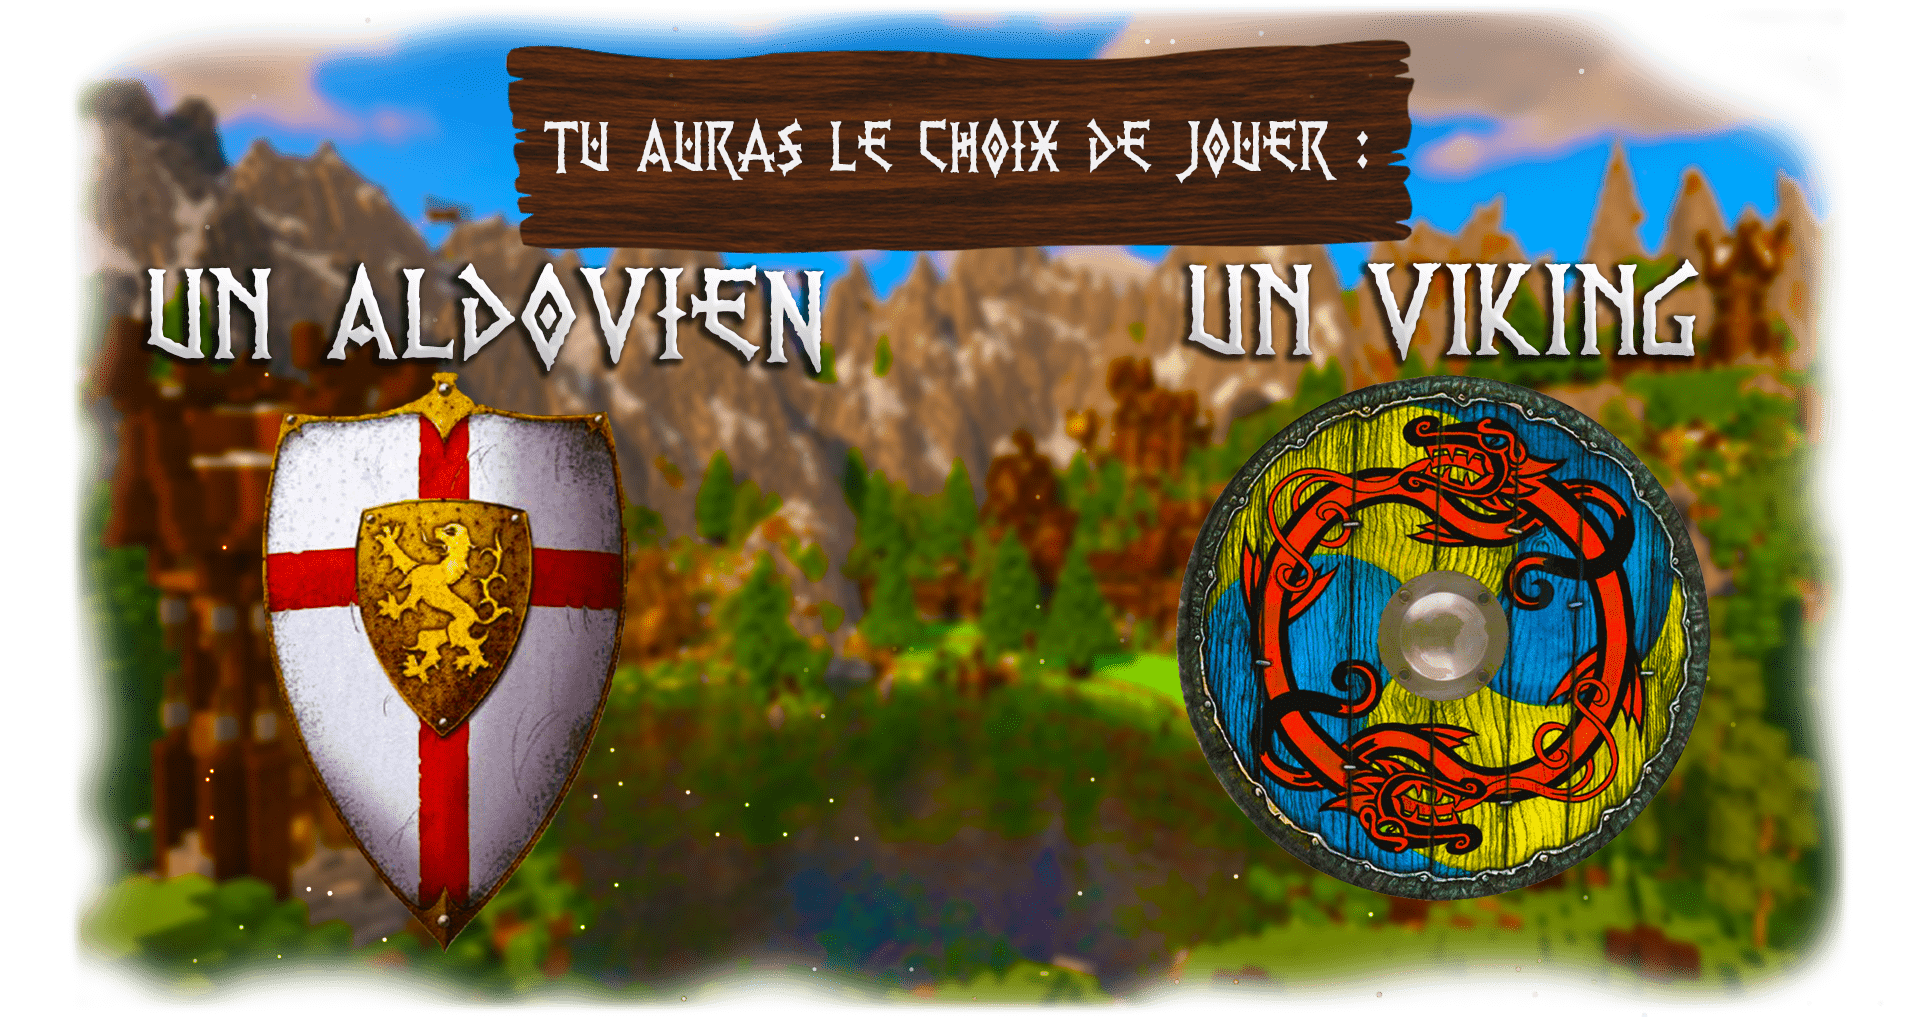 banniere viking 2-min (1).png